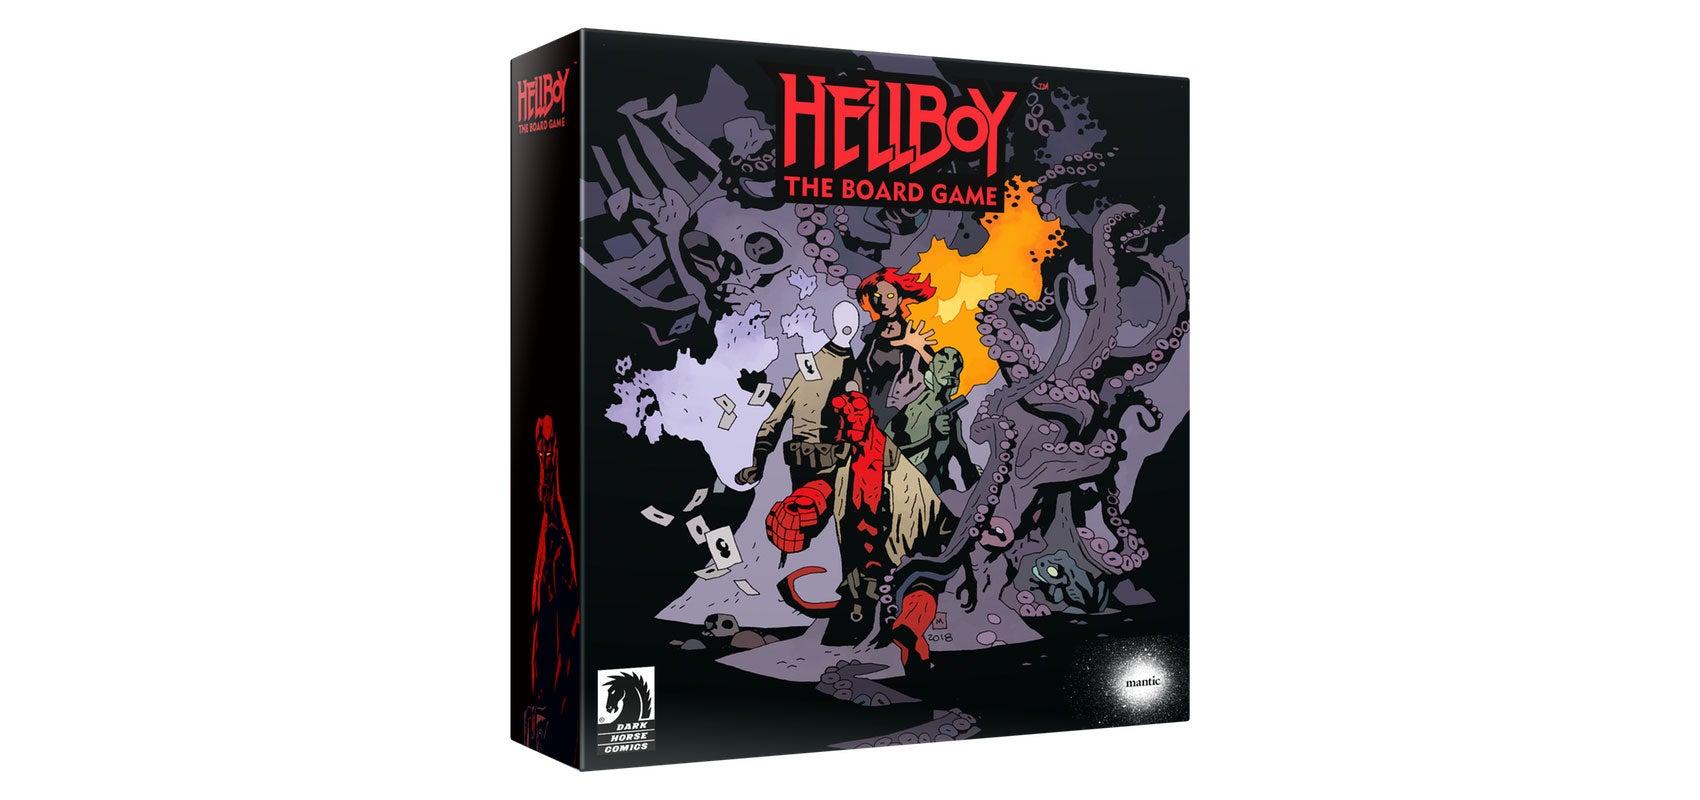 Hellboy Board Game Kickstarter Raises $1 Million In About Five Seconds